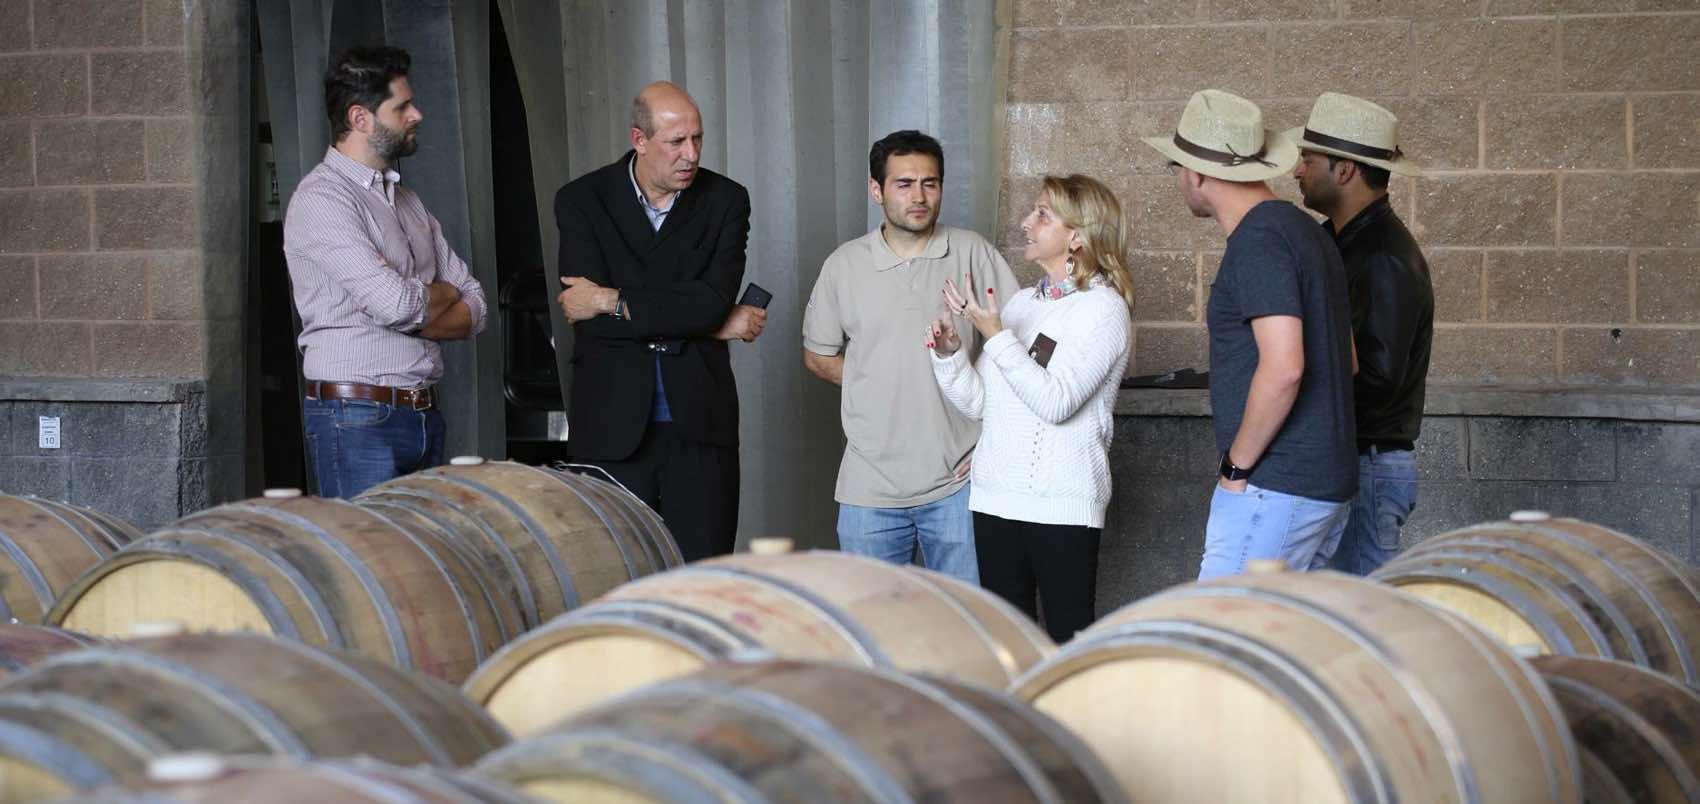 Susana Balbo meet guests at her vinery